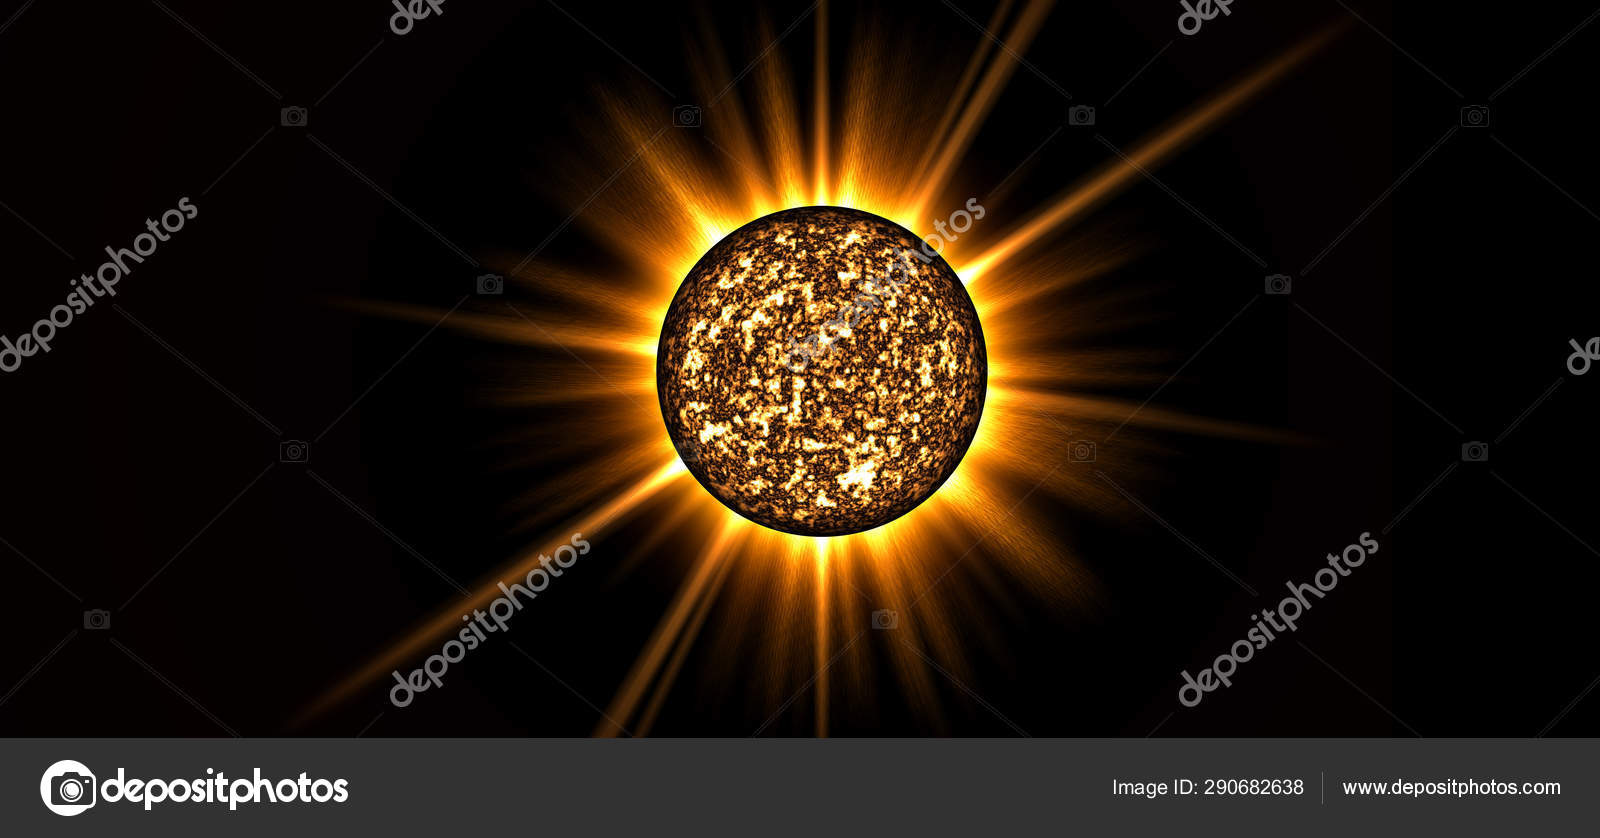 Sun, planet, space, rays, science, orange, yellow, black